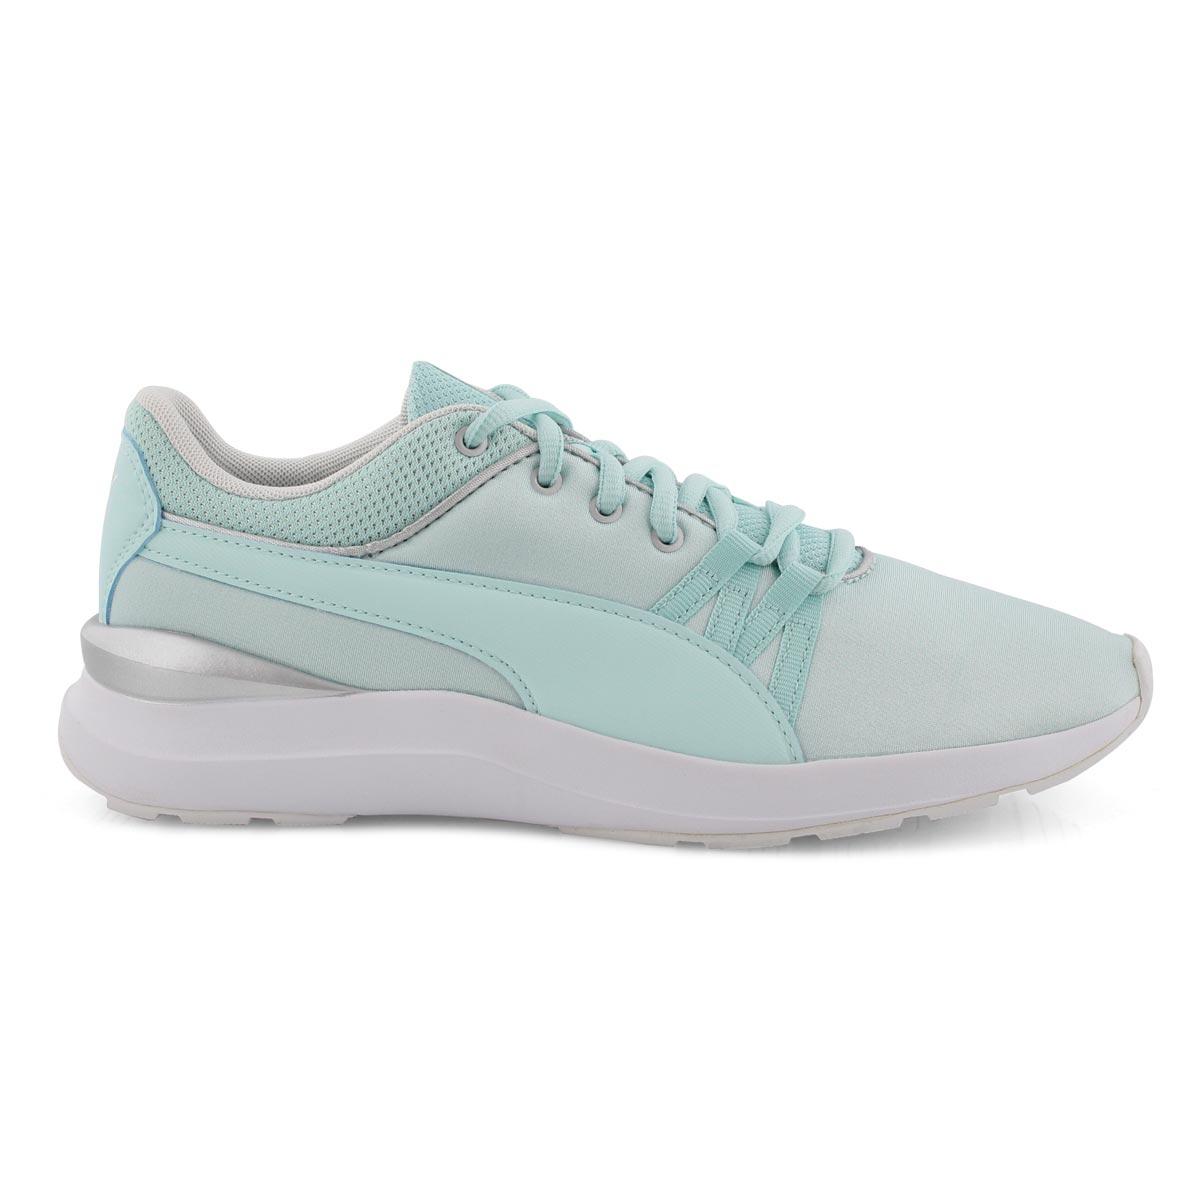 Lds Adela aqua lace up sneaker